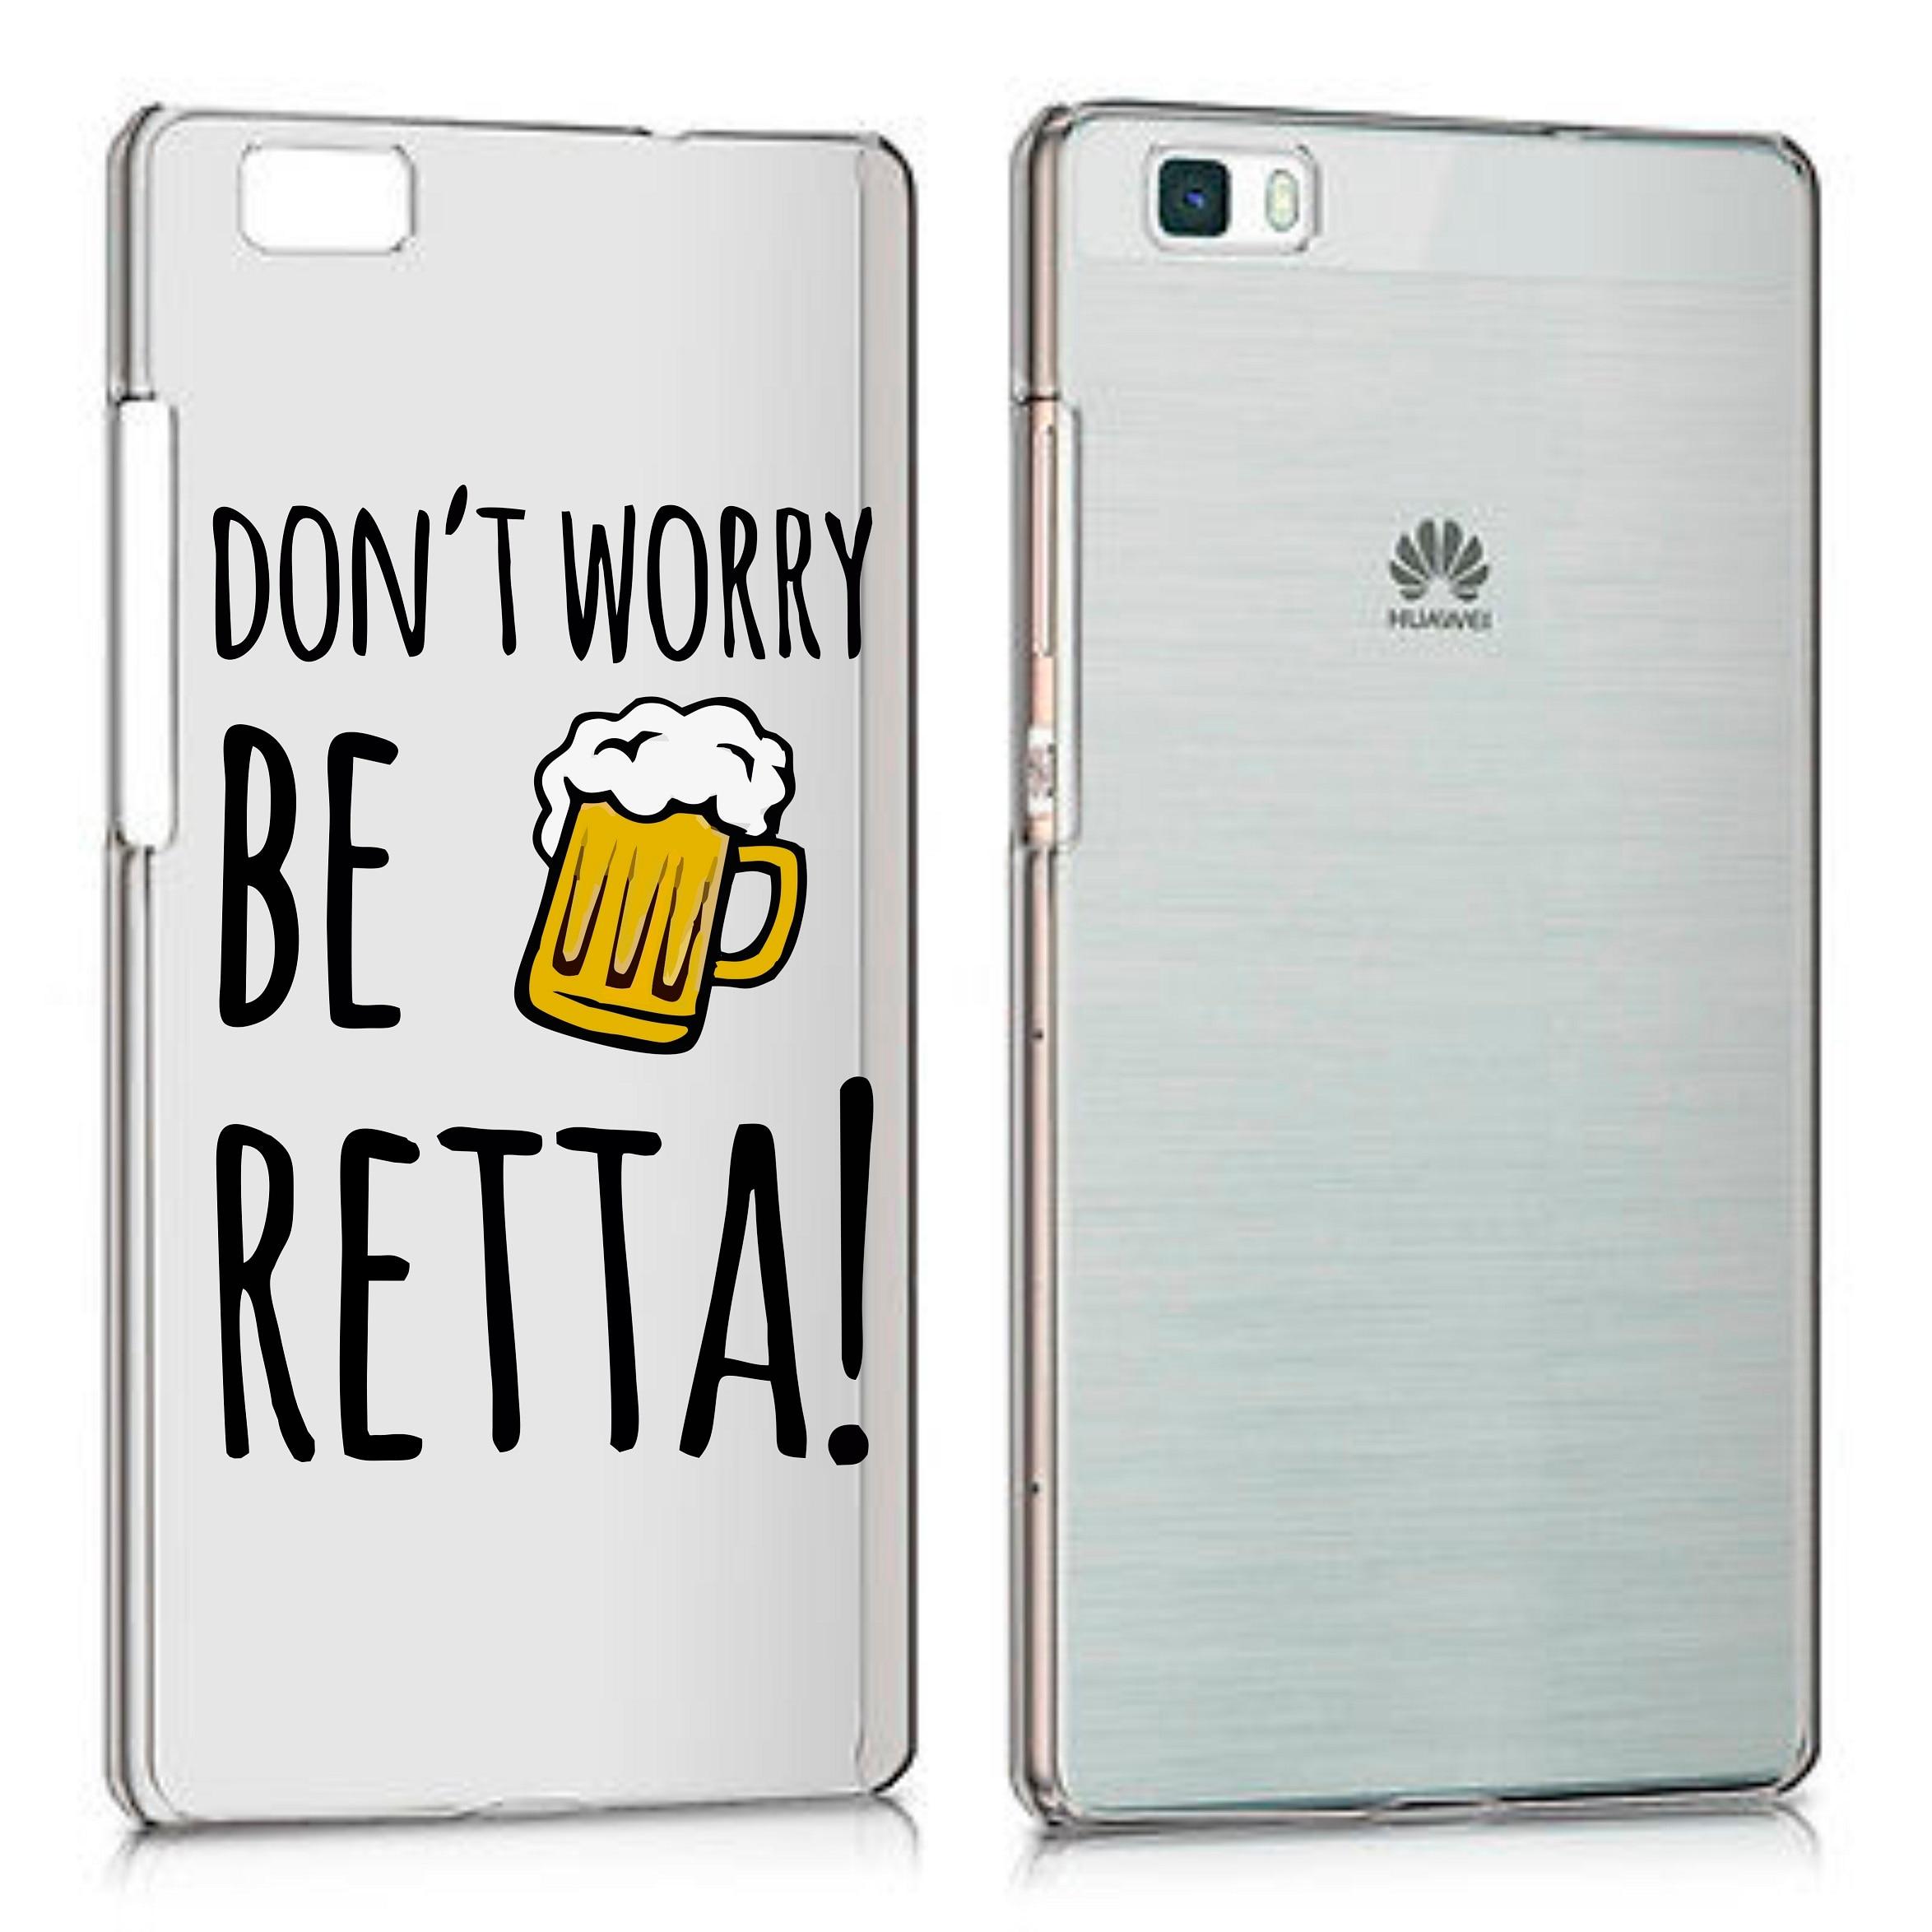 Cubierta por Tutti Gli Smartphone Huawei p8 p8 Lite p9 p9 Lite p10 p10 Lite p20 Lite-No te preocupes ser RETTA hecho en Italia